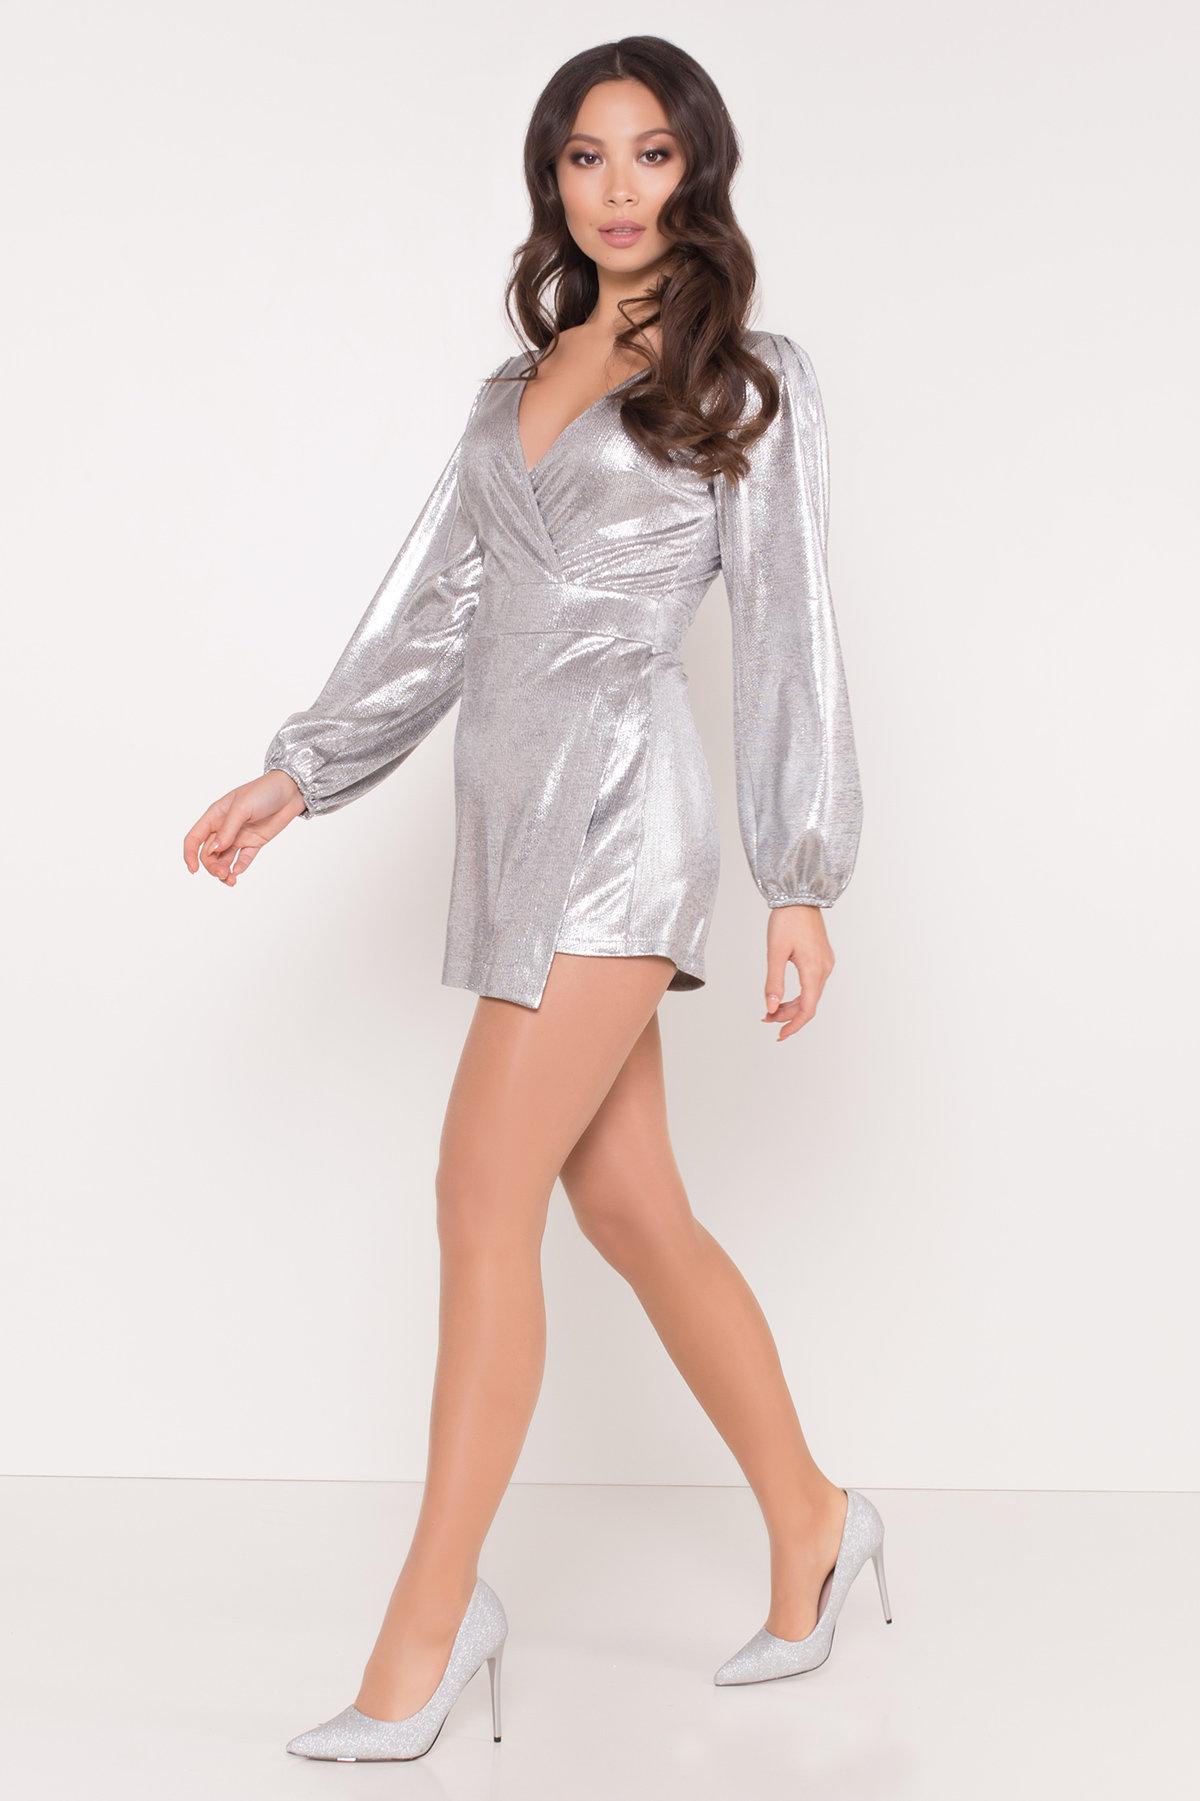 Комбинезон с шортами цвета металлик Шелли 8553 АРТ. 44892 Цвет: Серый/серебро - фото 1, интернет магазин tm-modus.ru